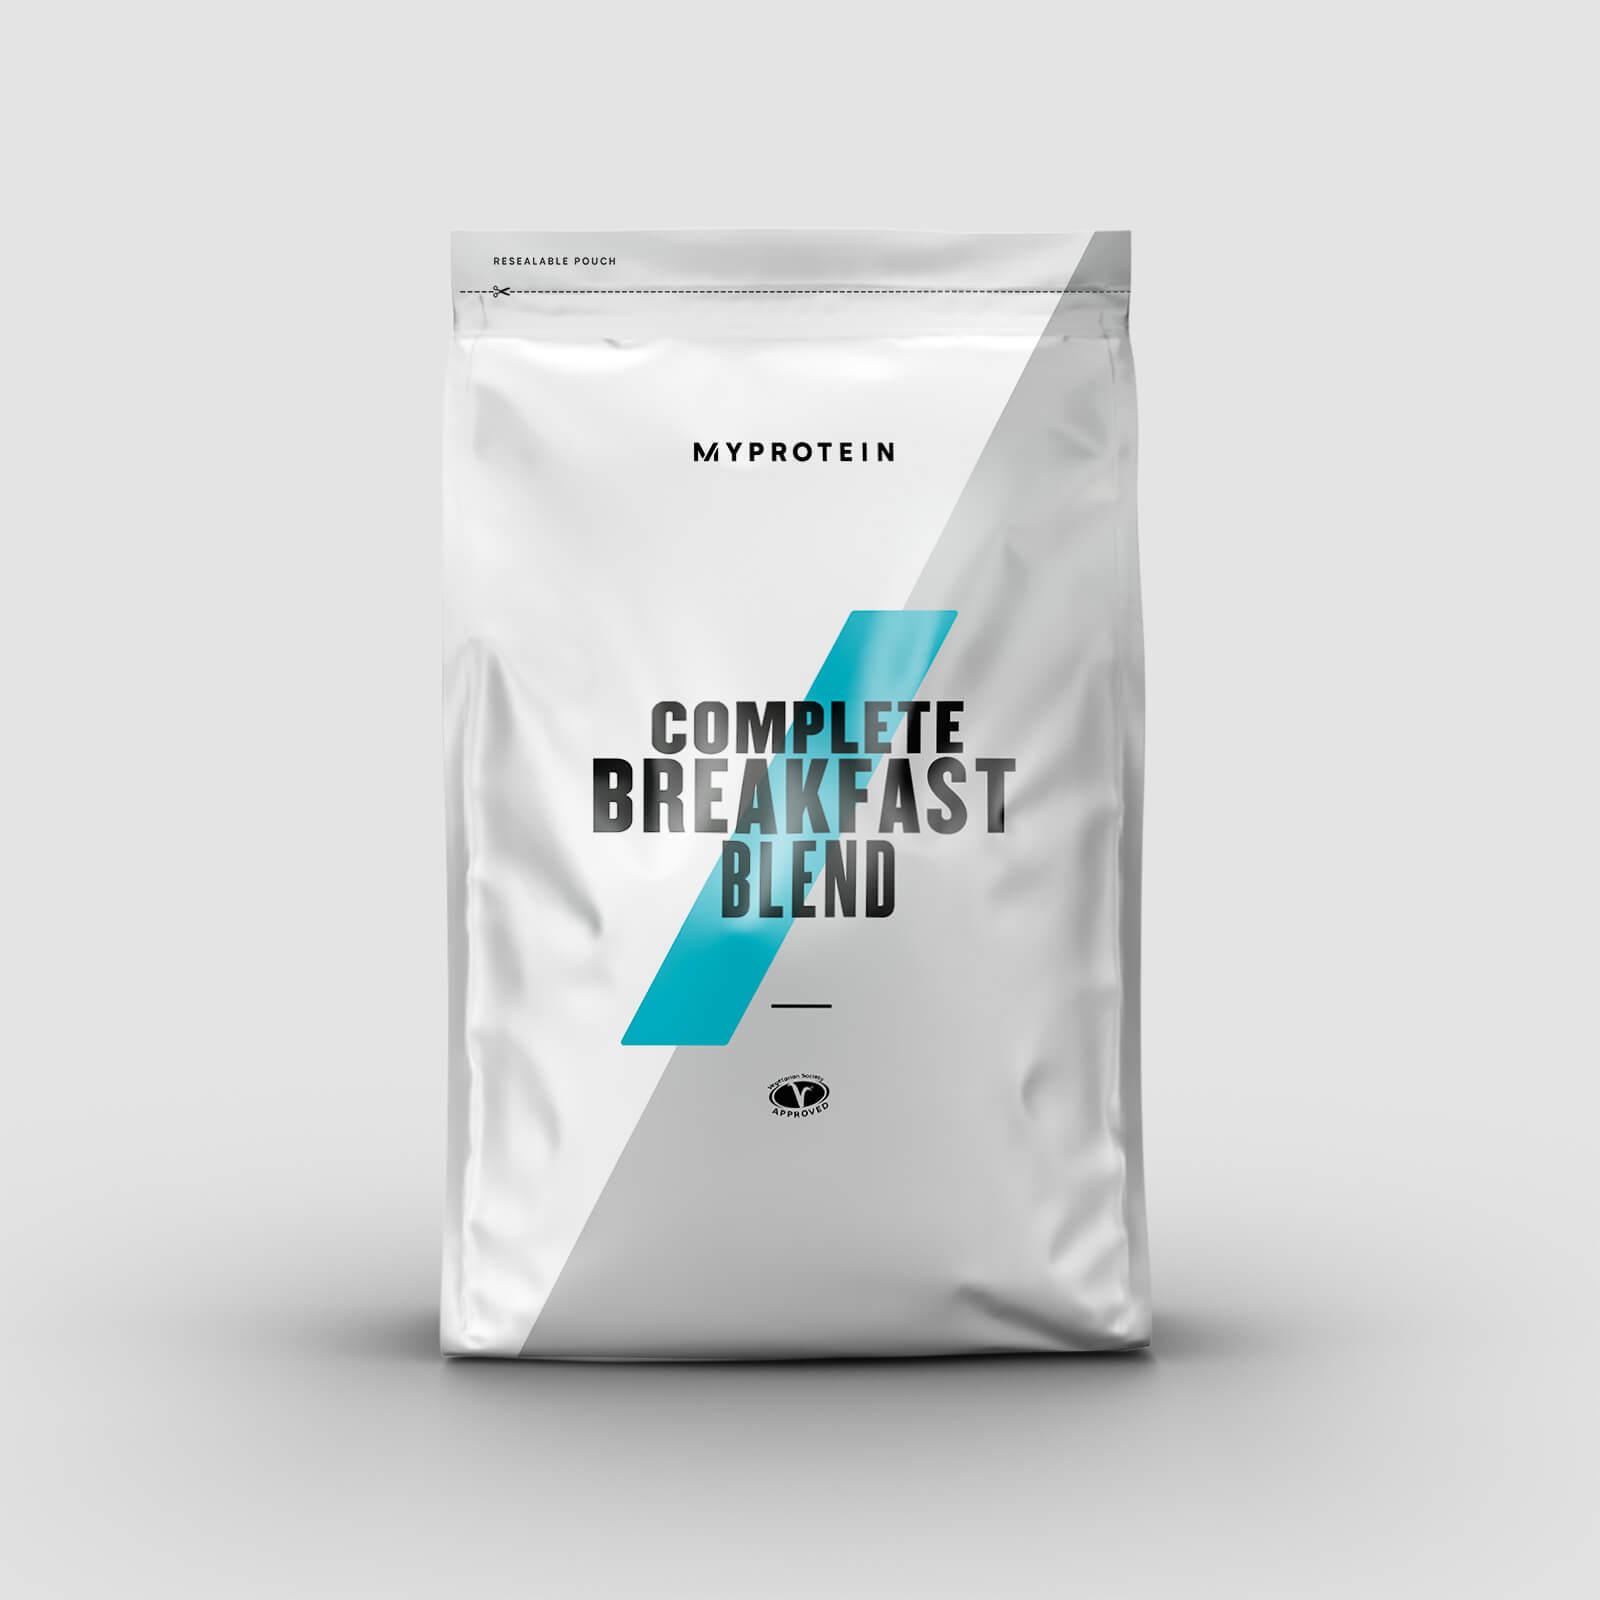 Complete Breakfast Blend